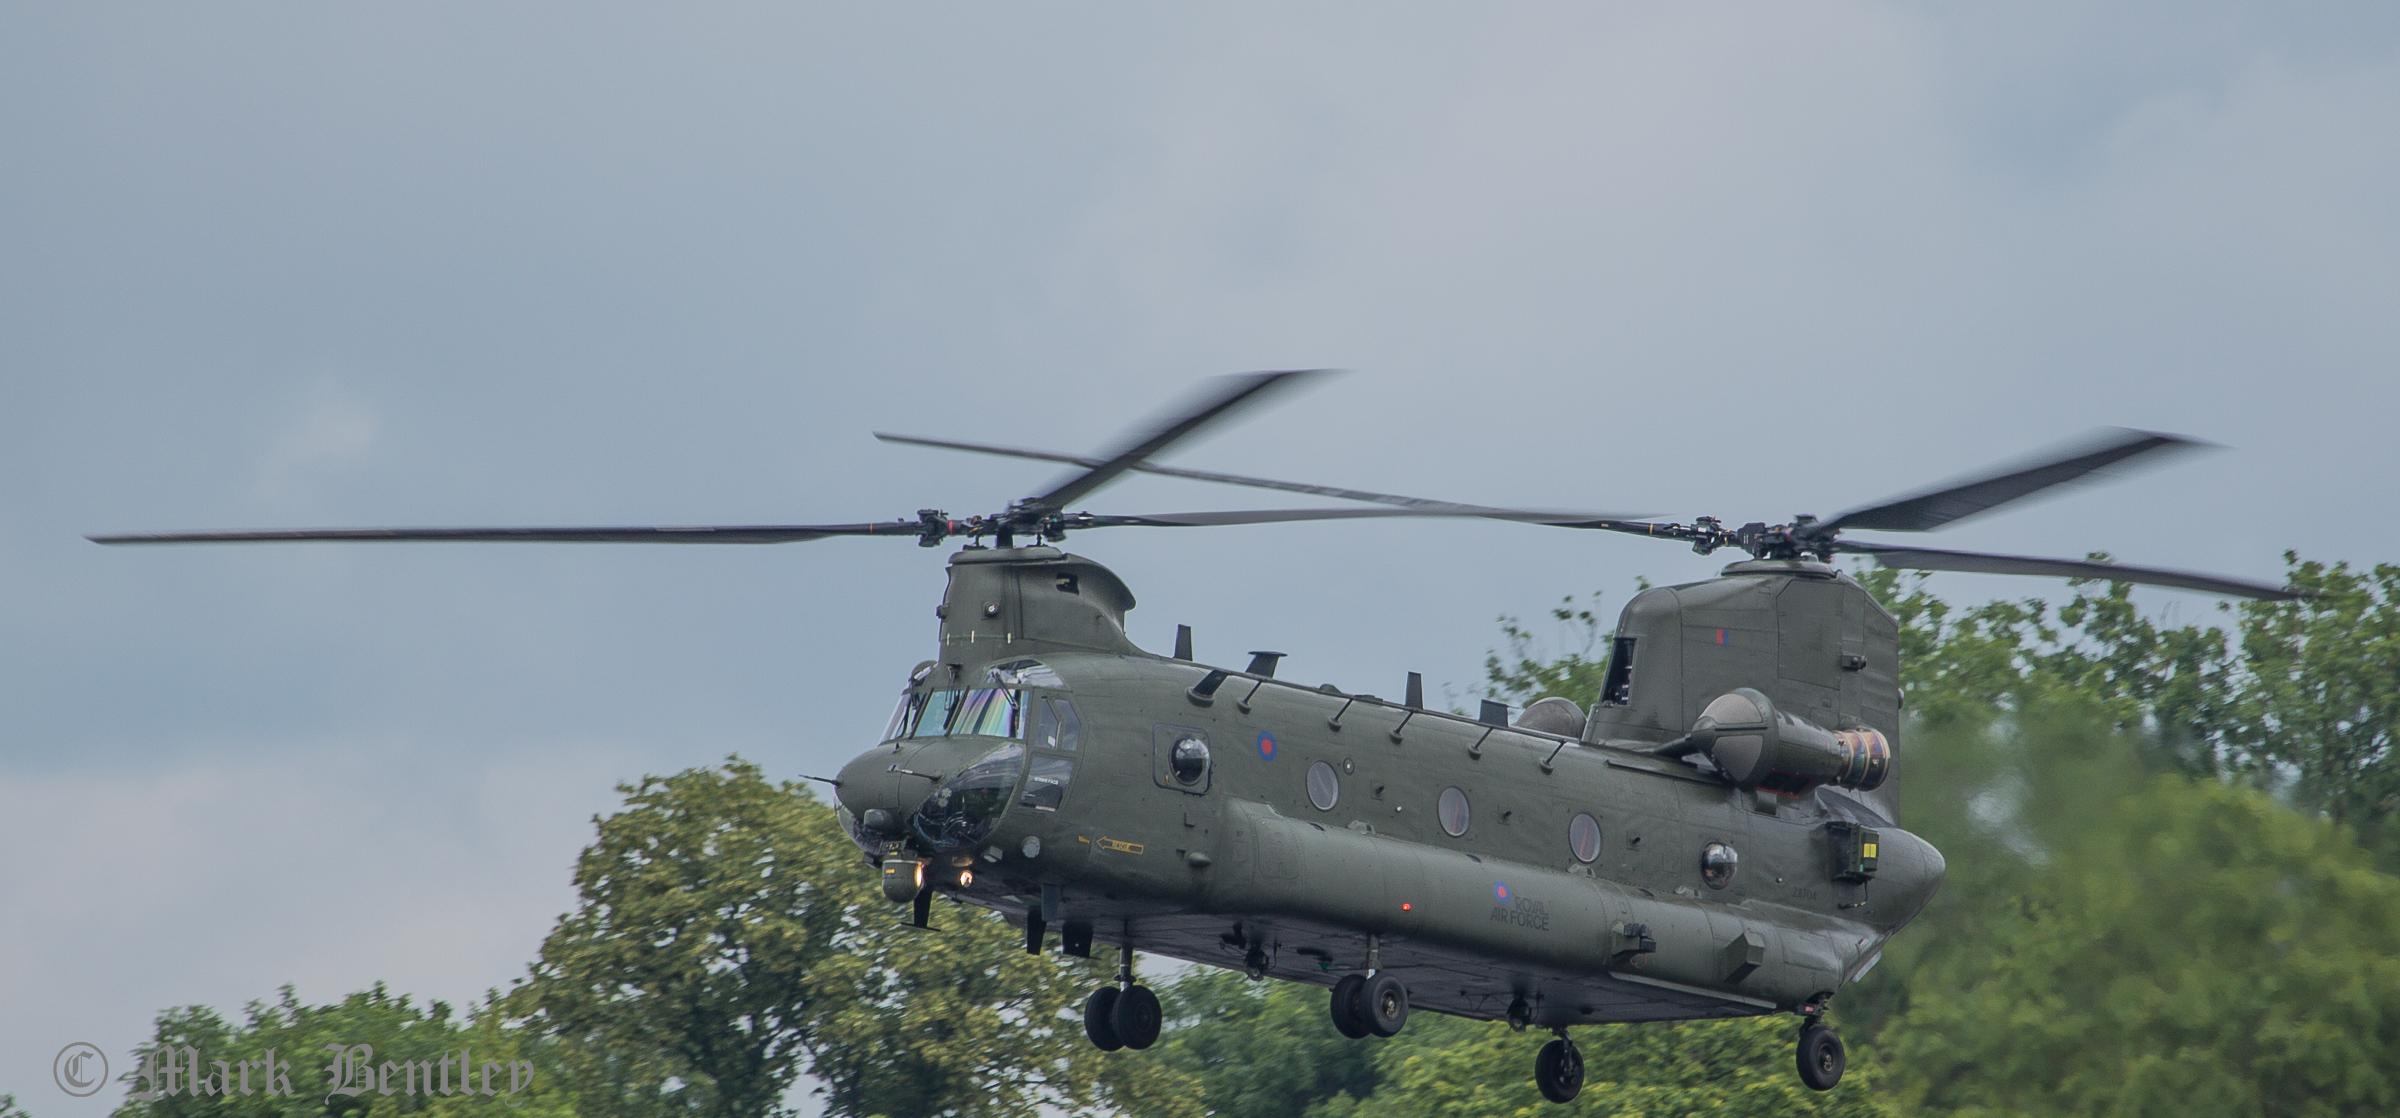 A045 RAF Chinook